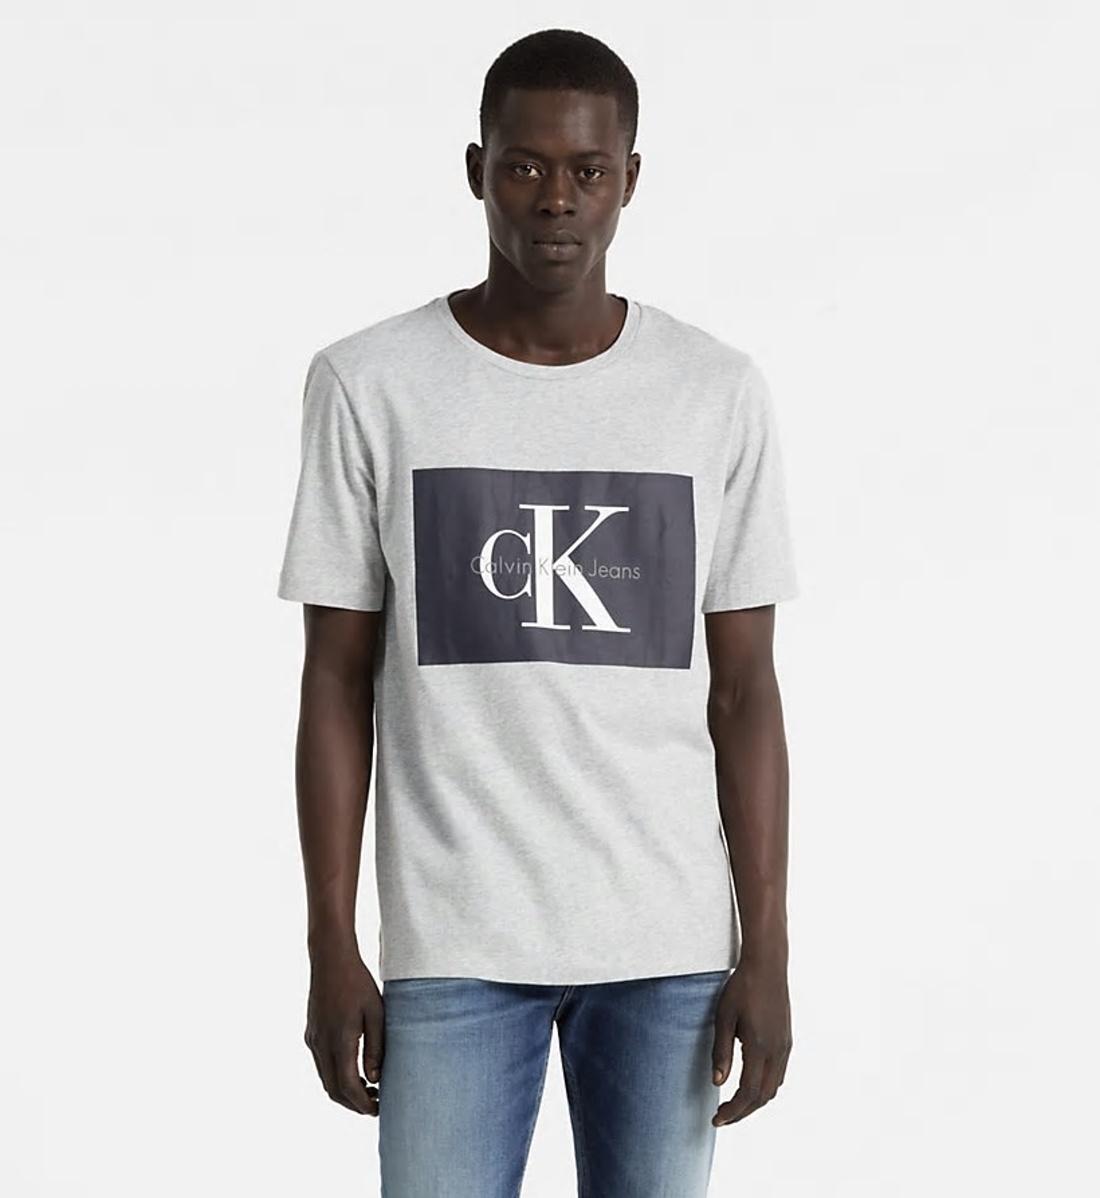 1fad61bc35 Calvin Klein pánské šedé tričko s potiskem - Mode.cz